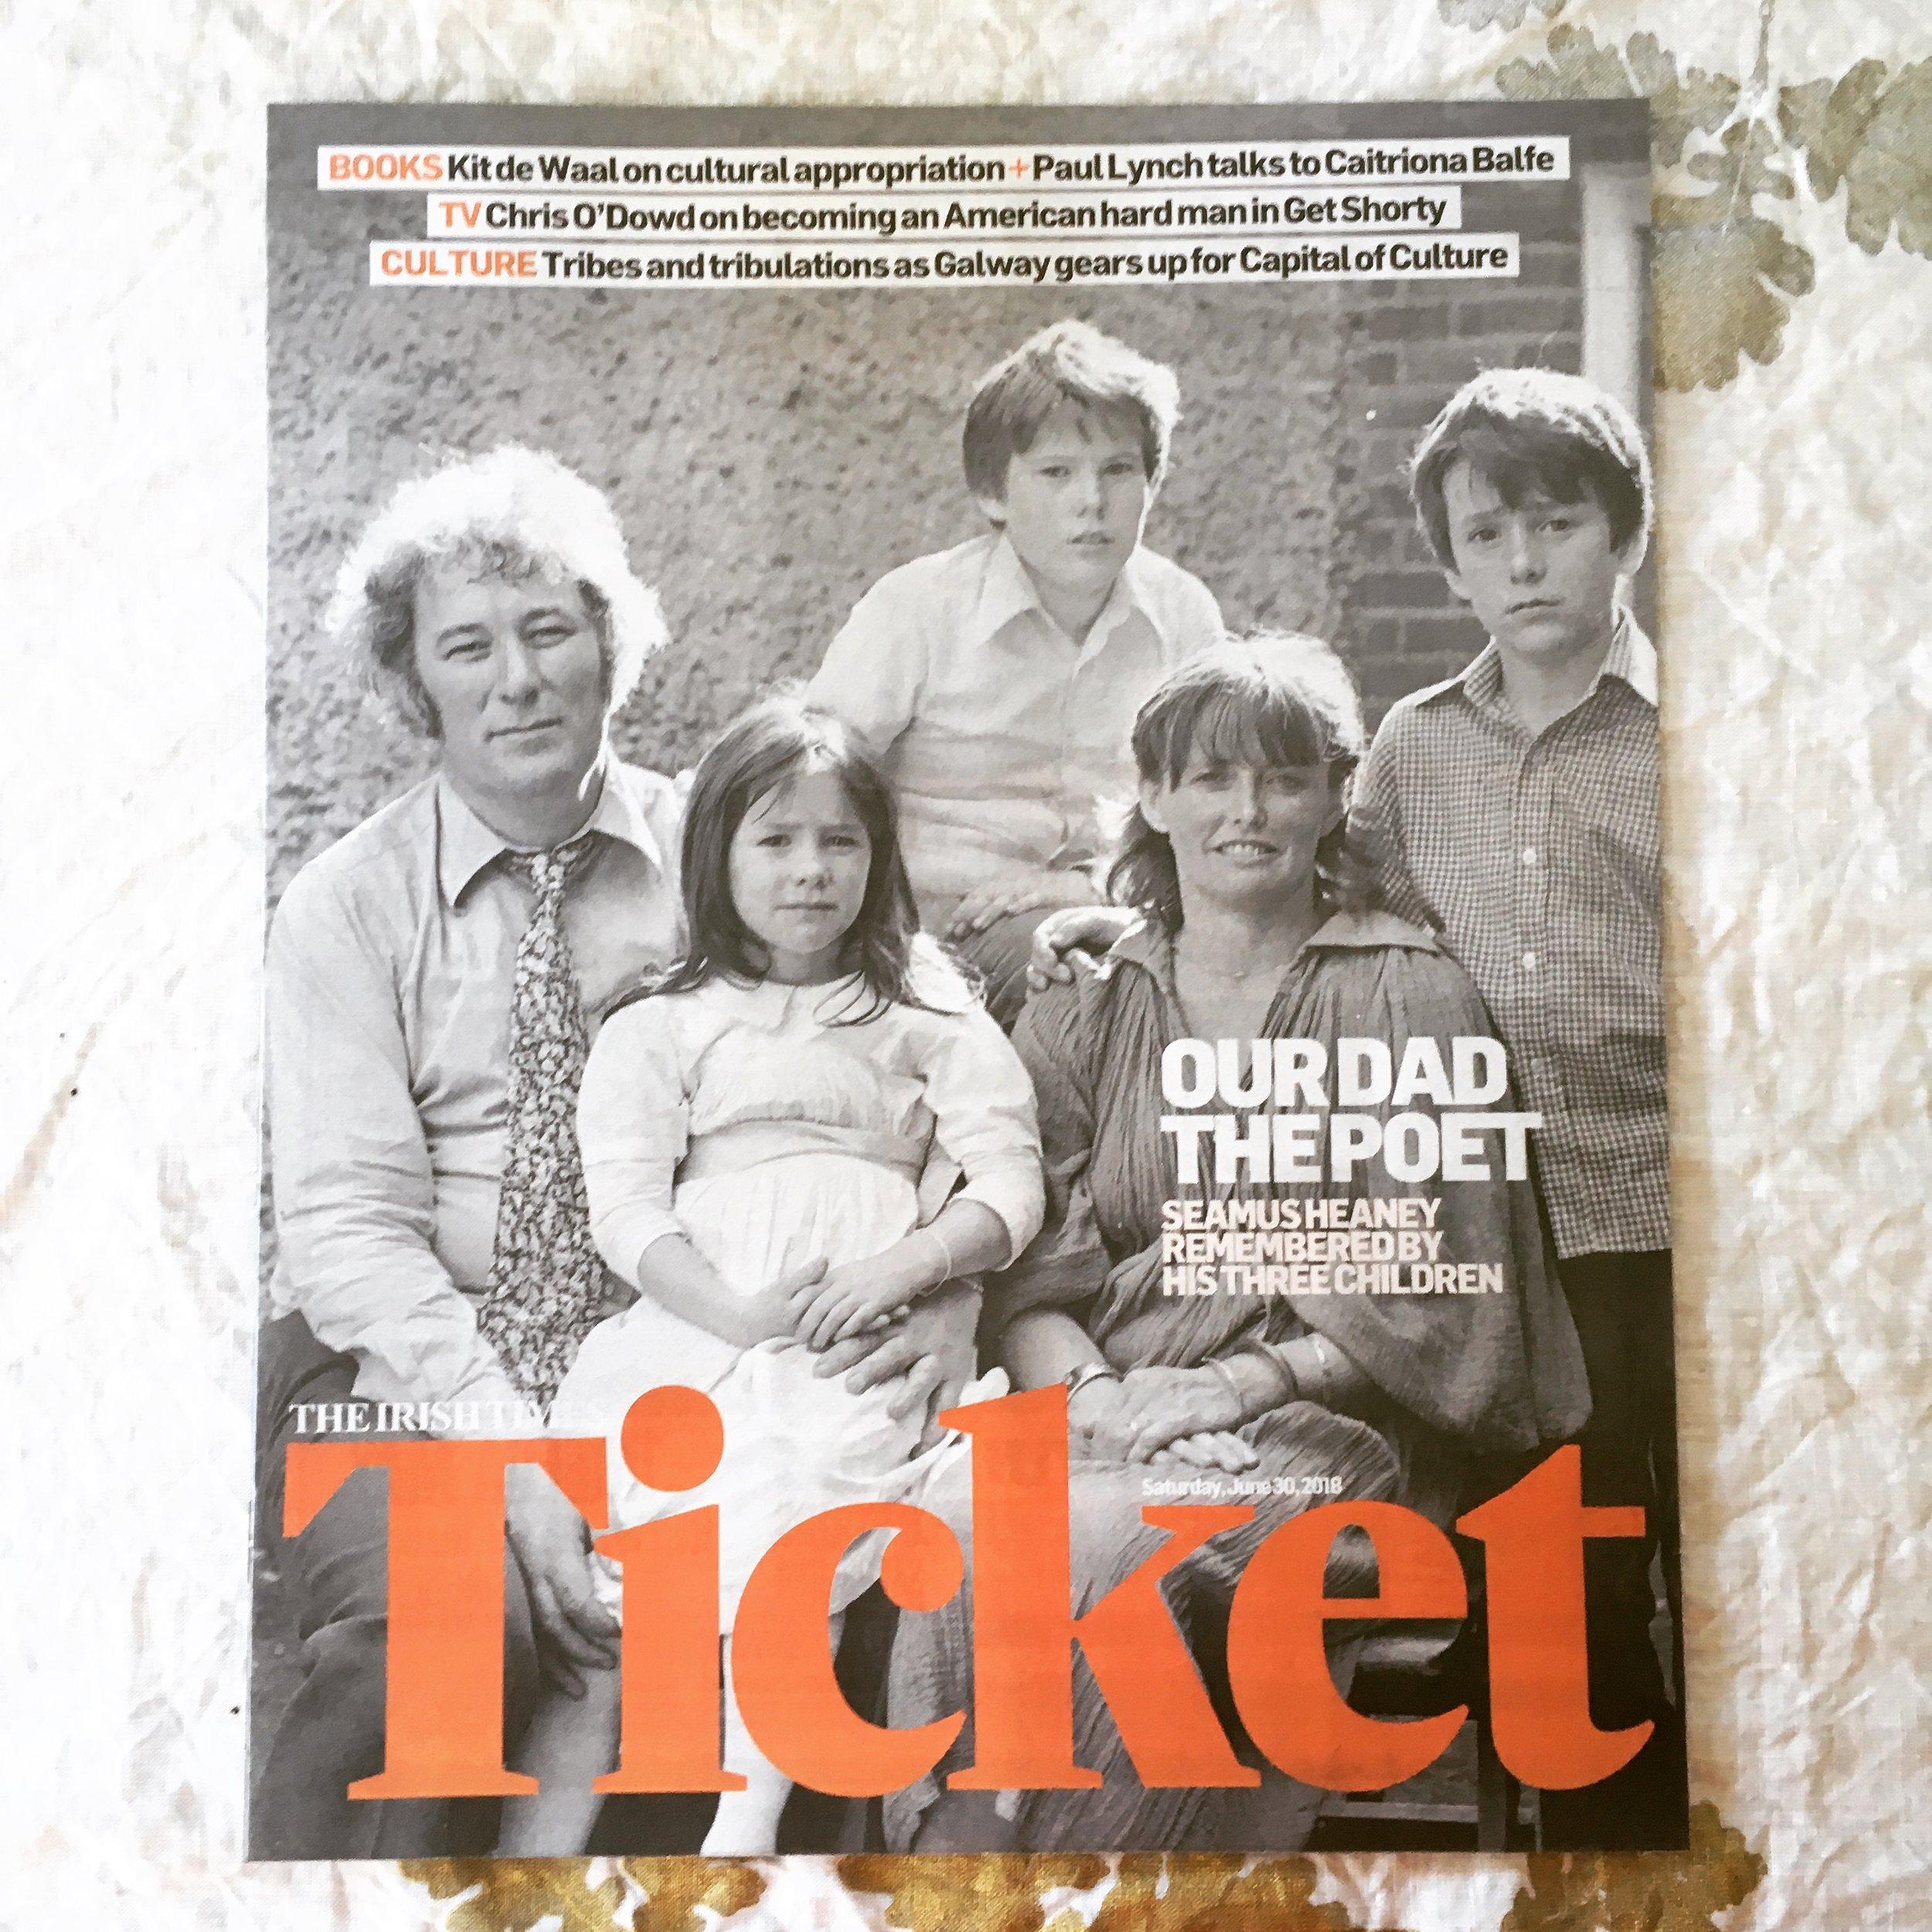 Irish Times Ticket